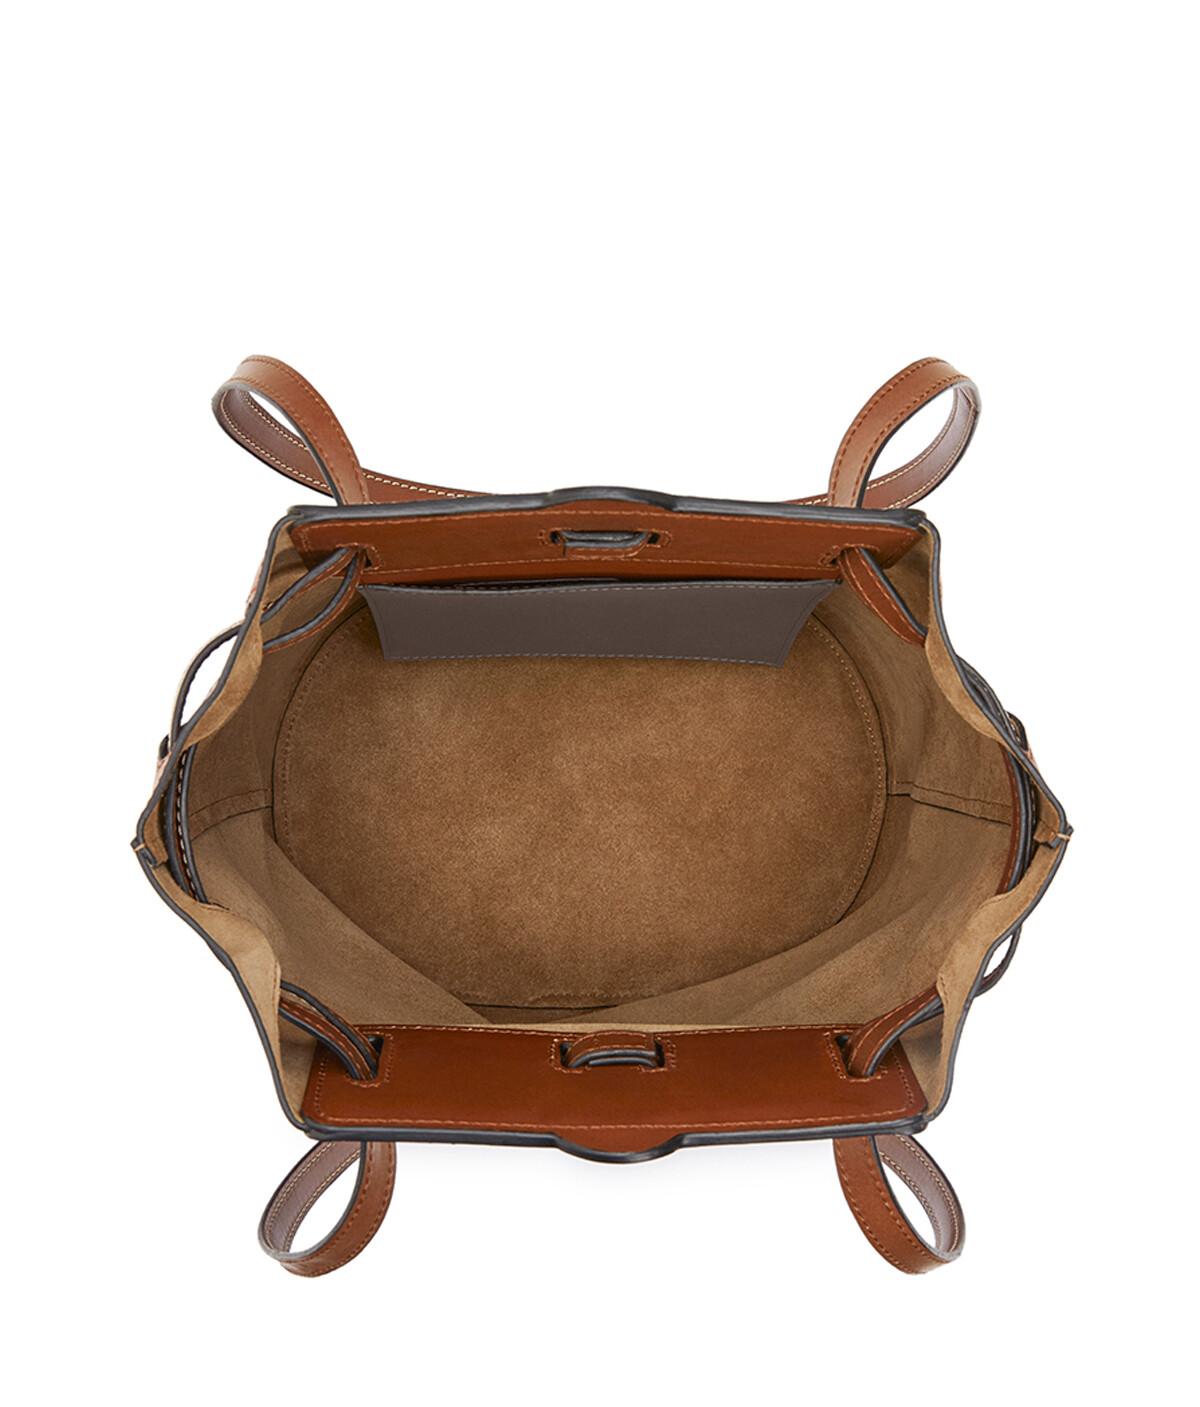 LOEWE Lazo Bucket Dark Taupe/Tan front